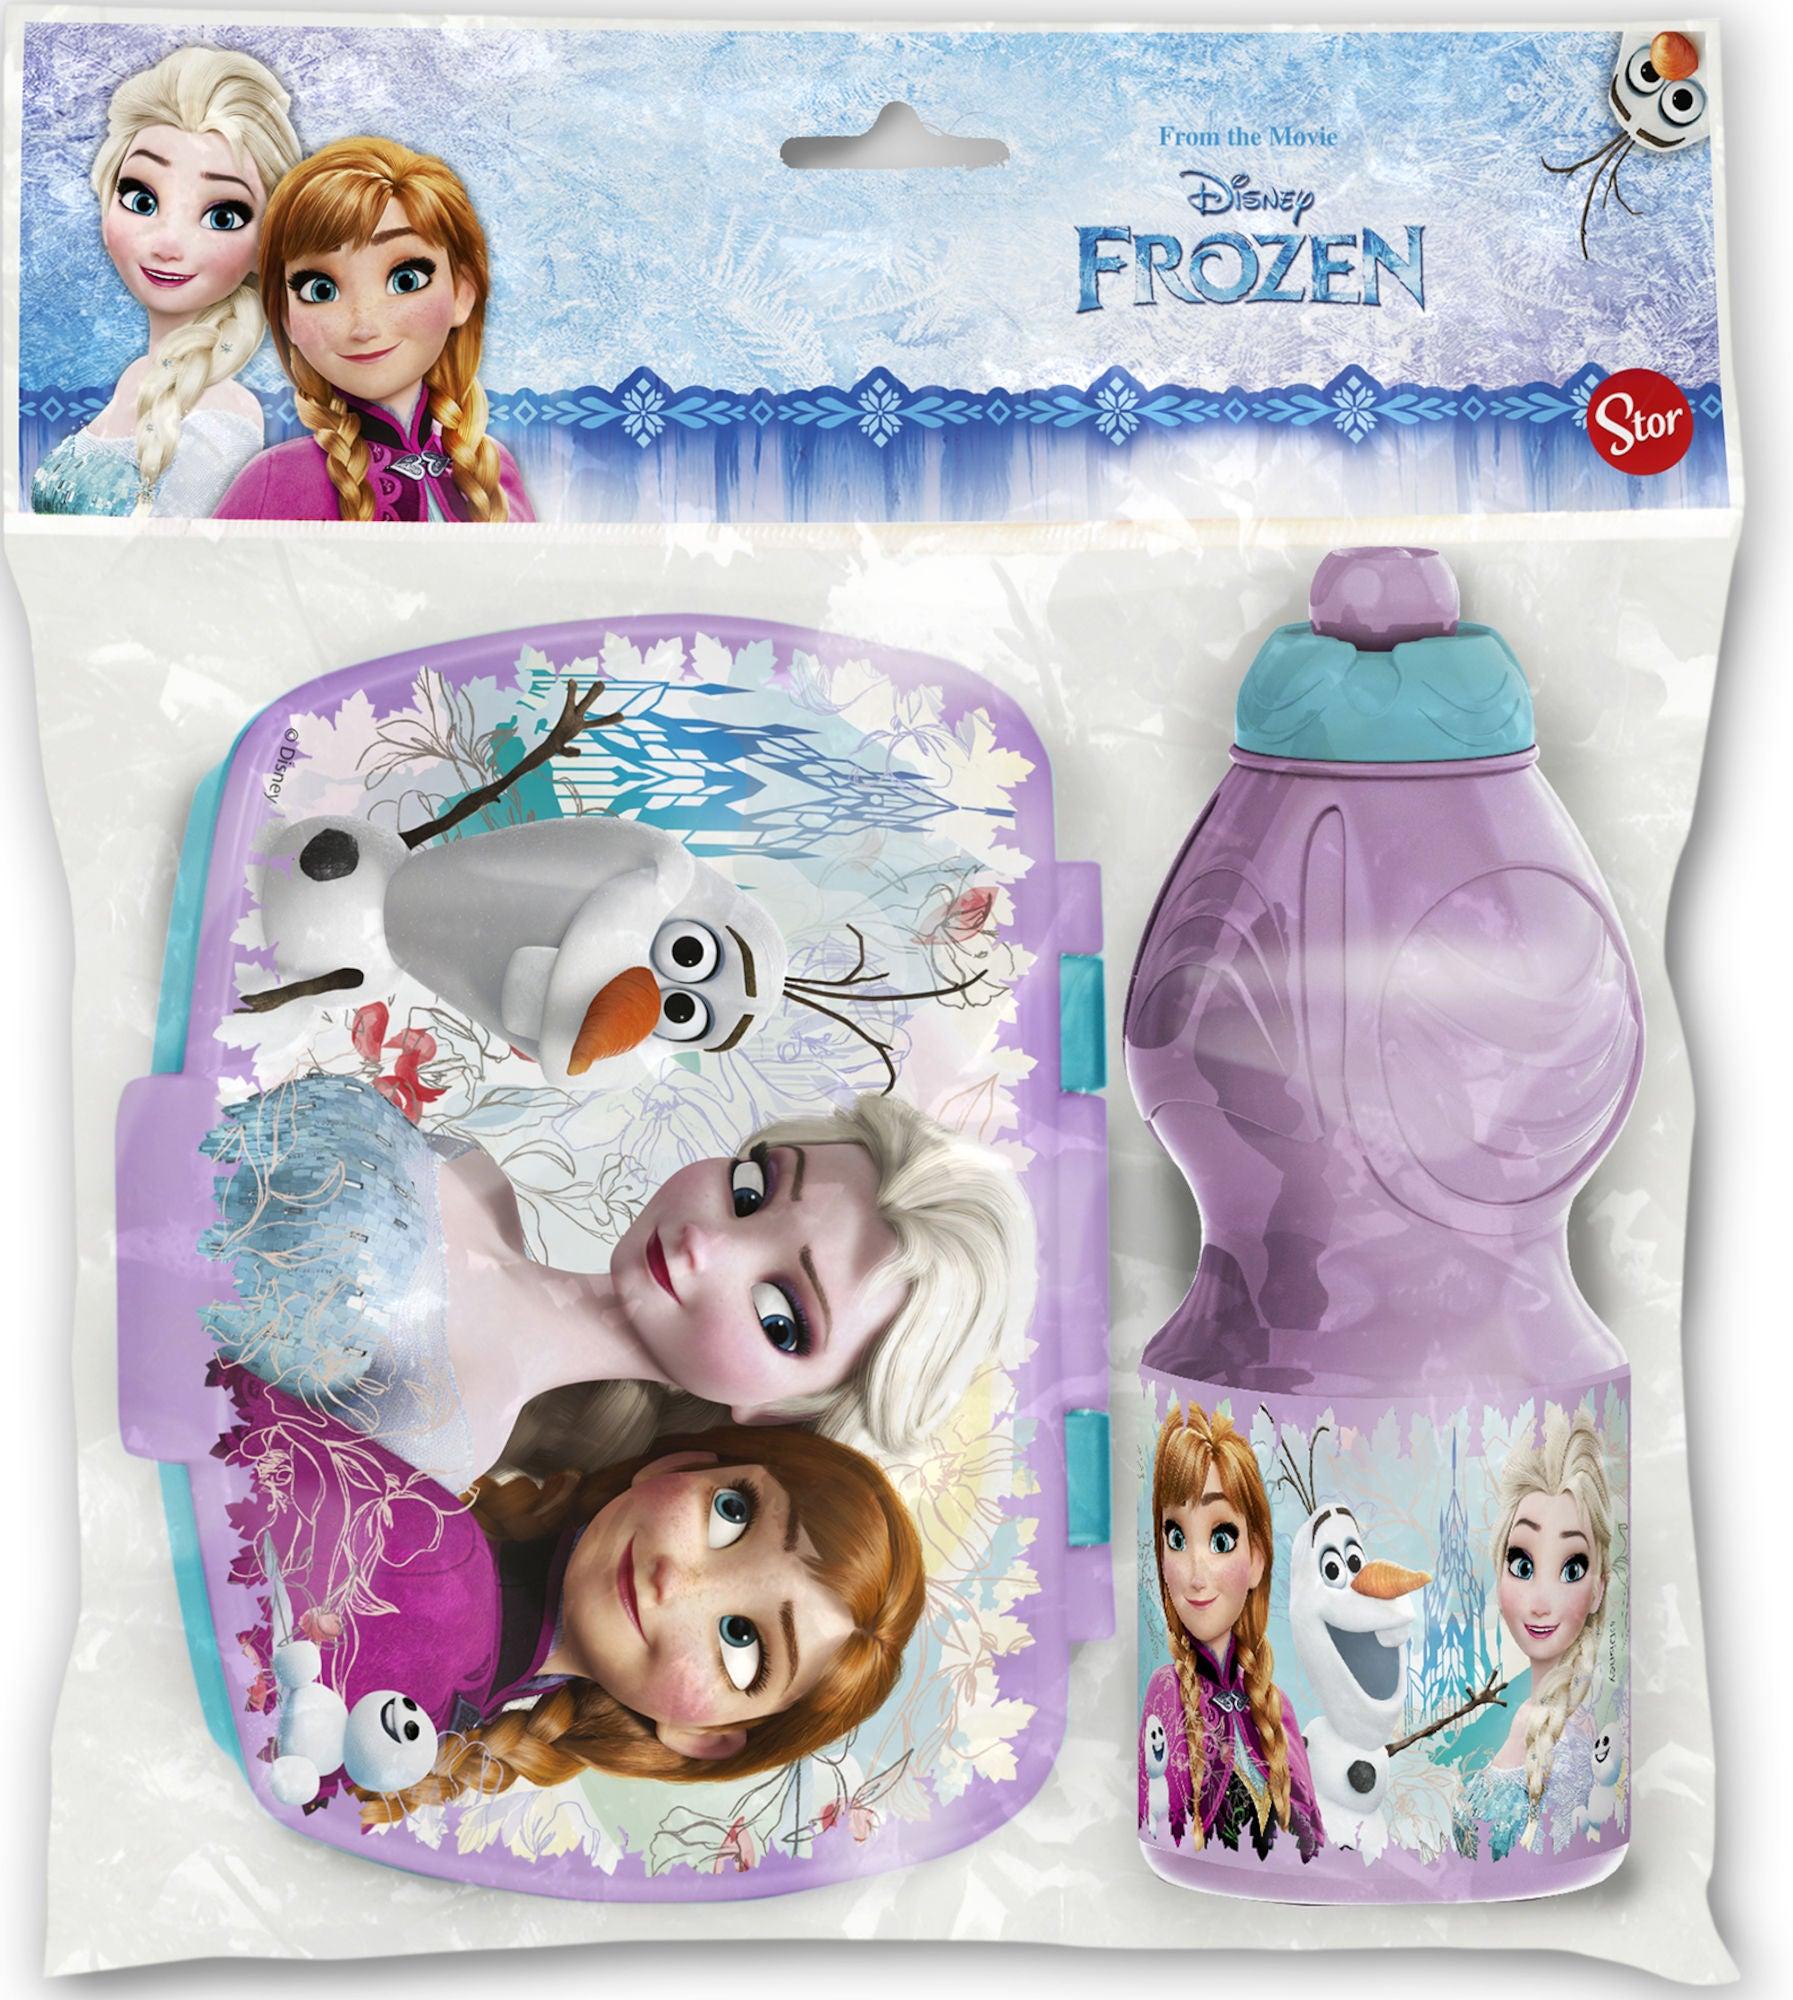 Disney Frozen Lunsjsett